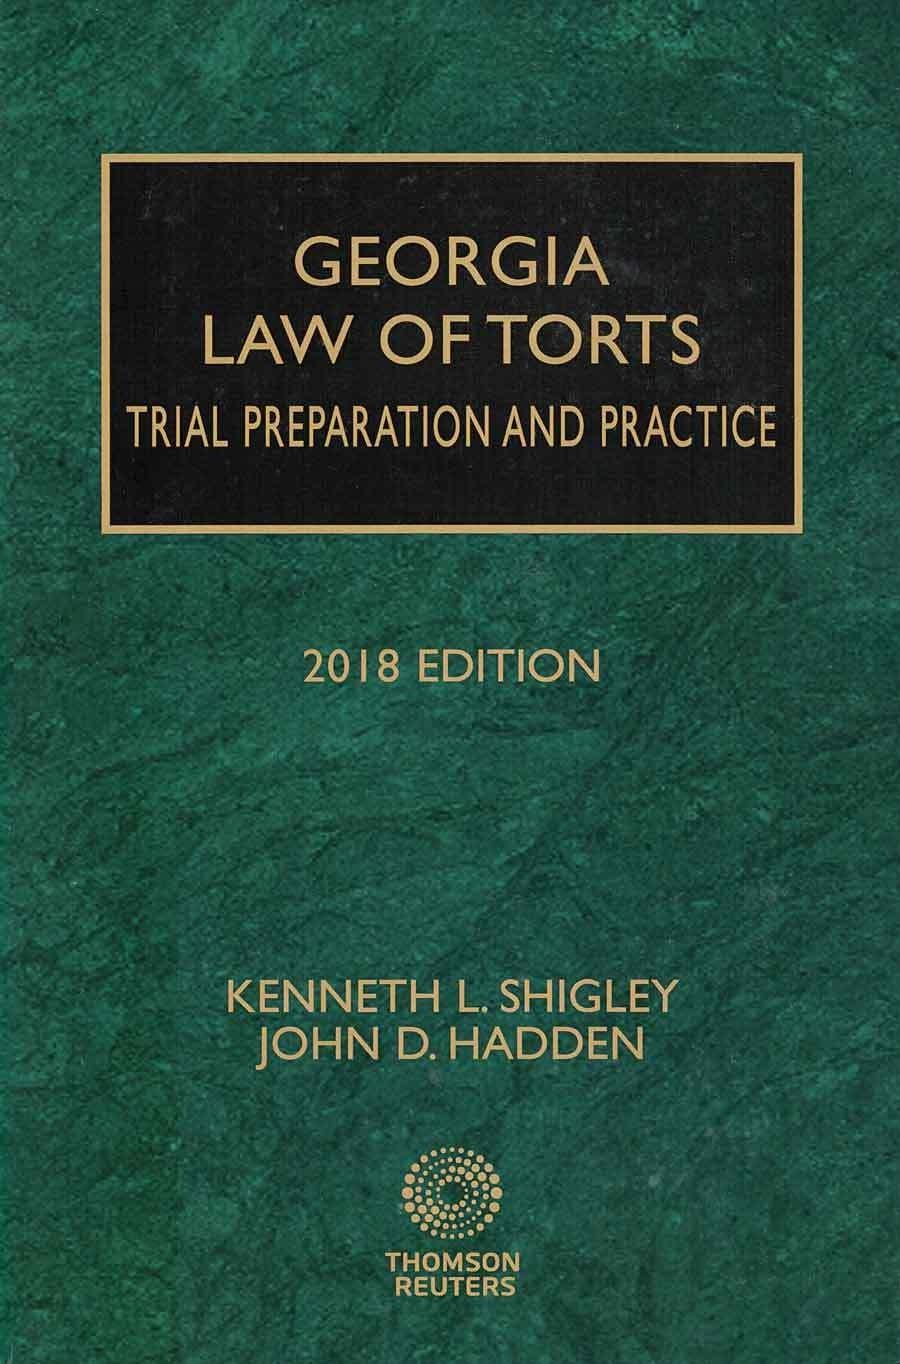 Georgia Law of Torts 2018 edition